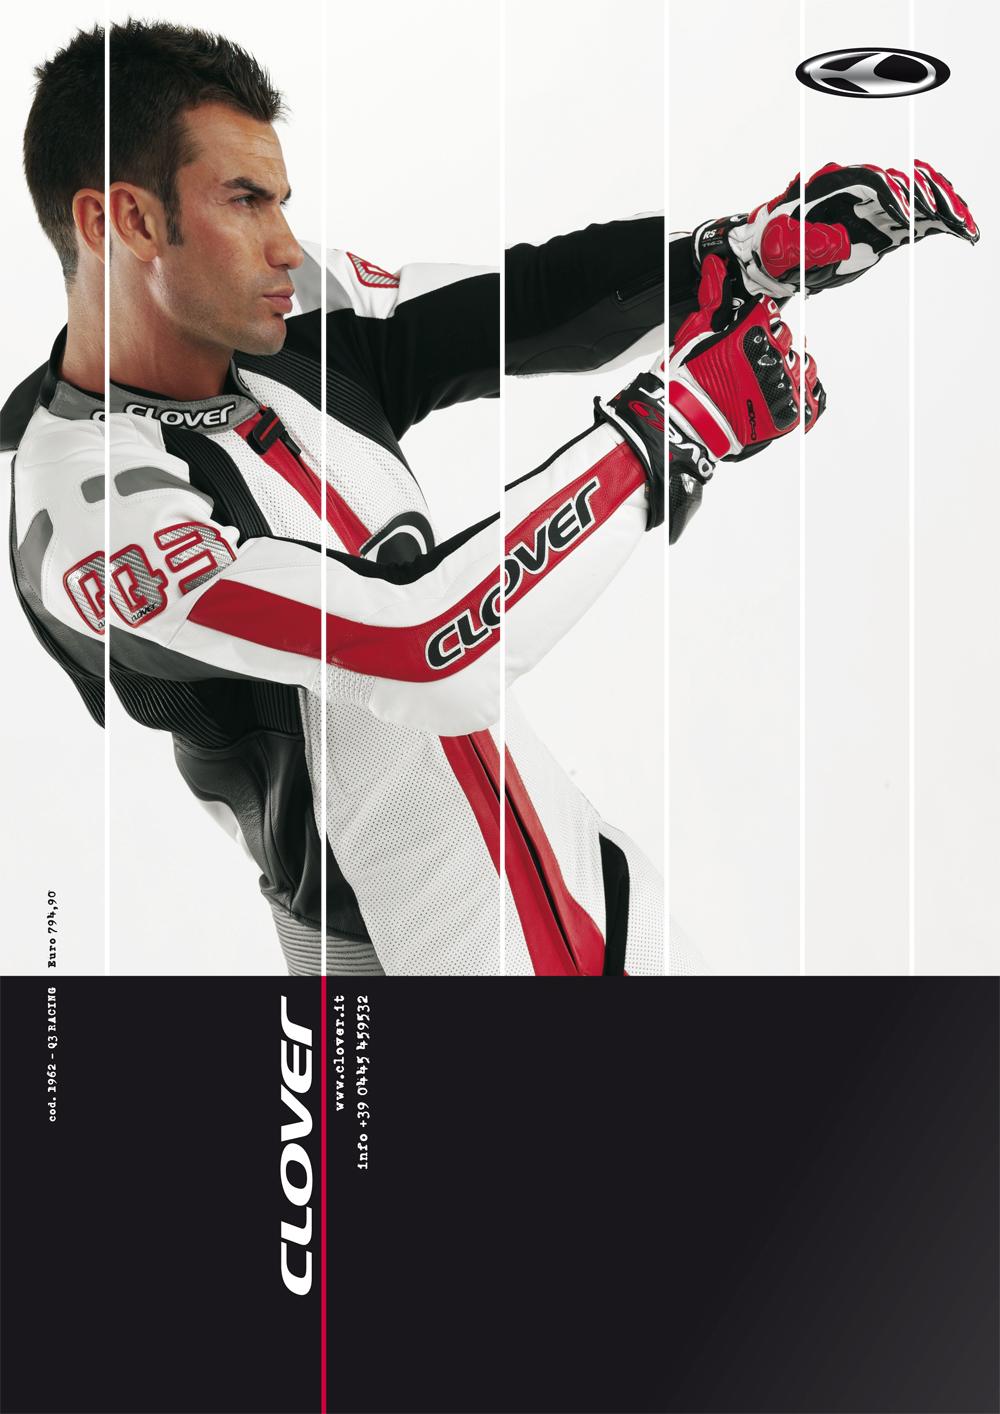 Advertising Campagna pubblicitaria Clover 2007